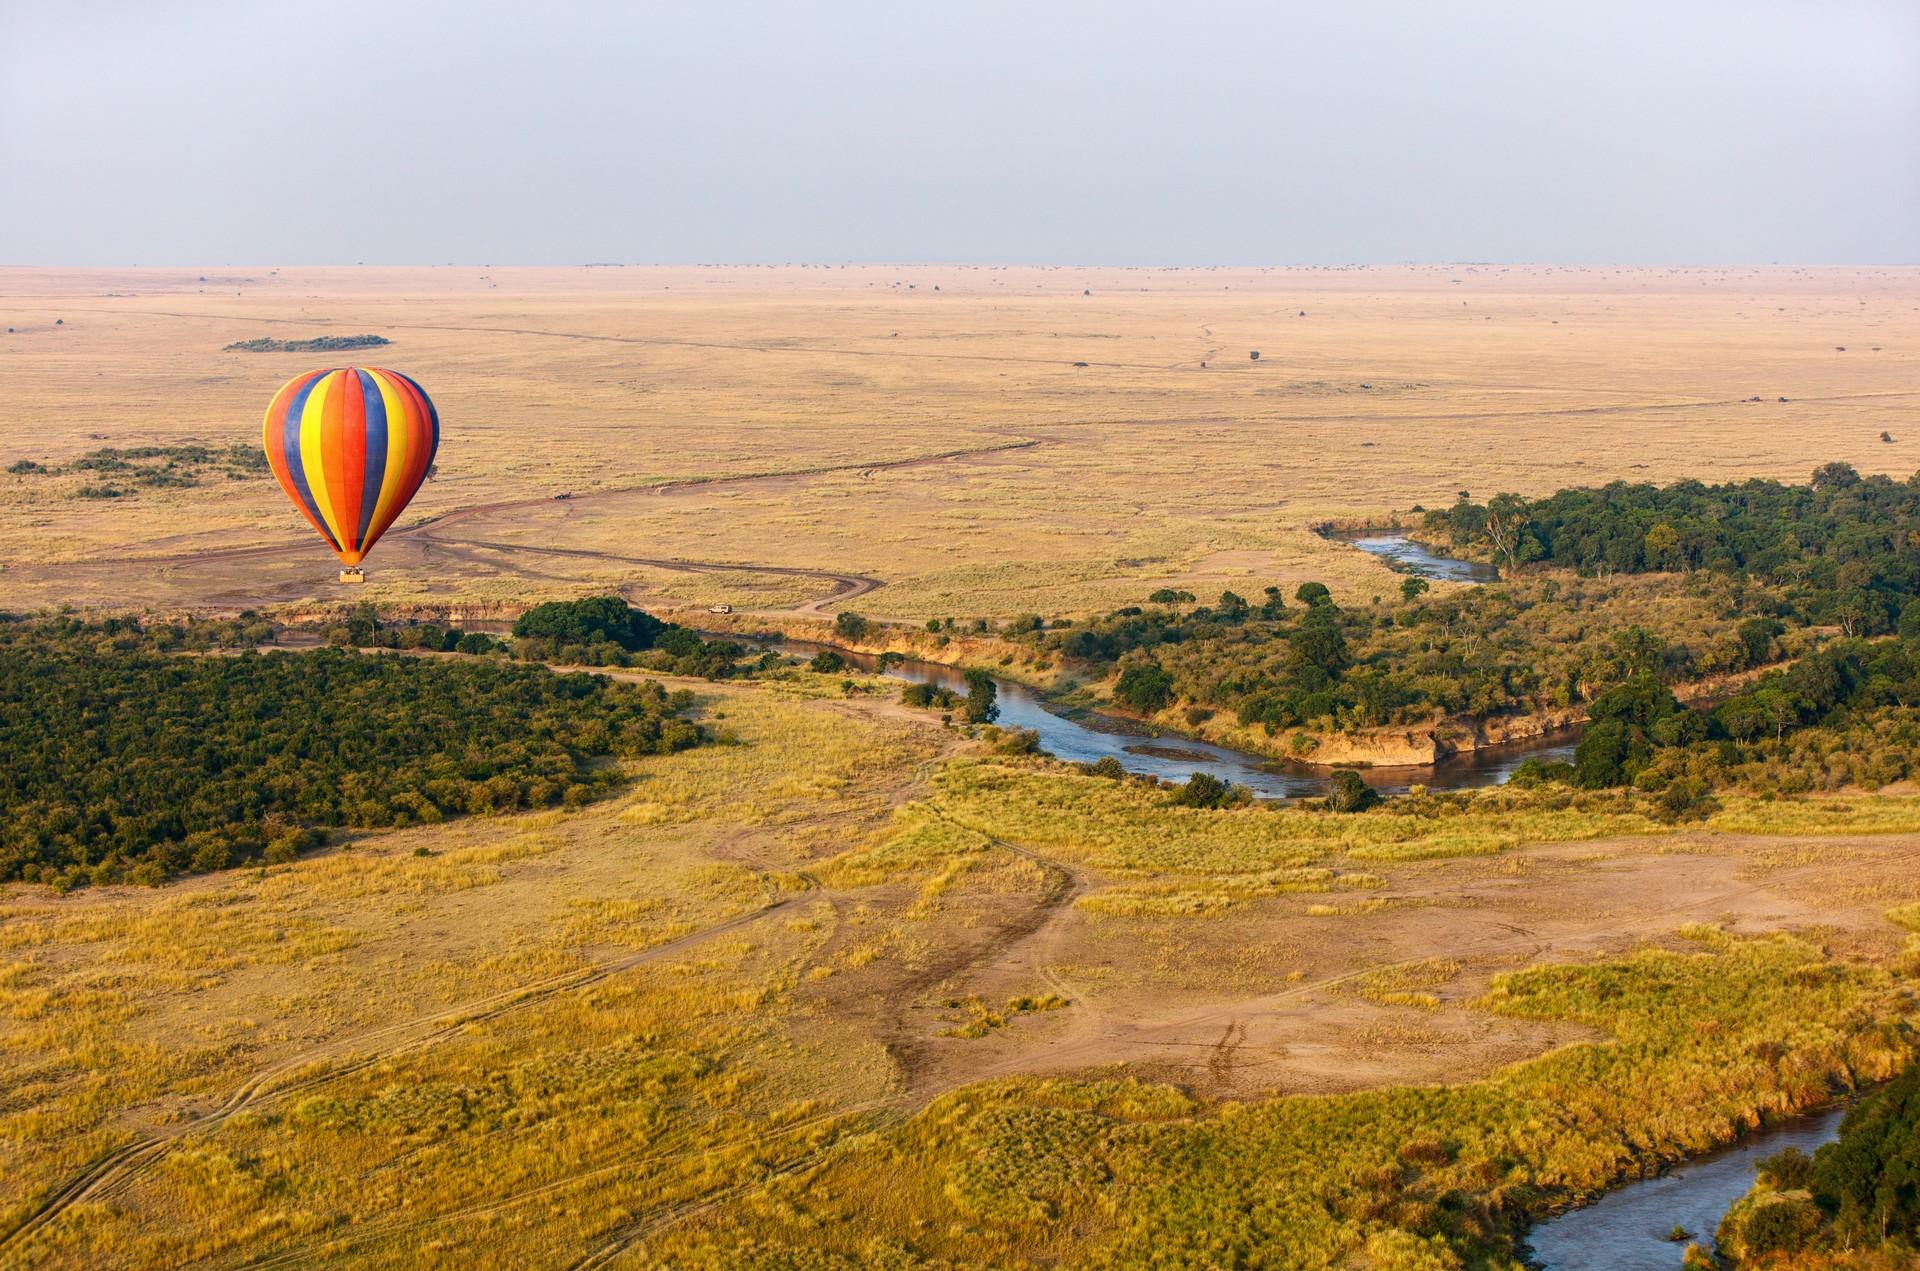 Hot air balloon over the Masai Mara, Kenya